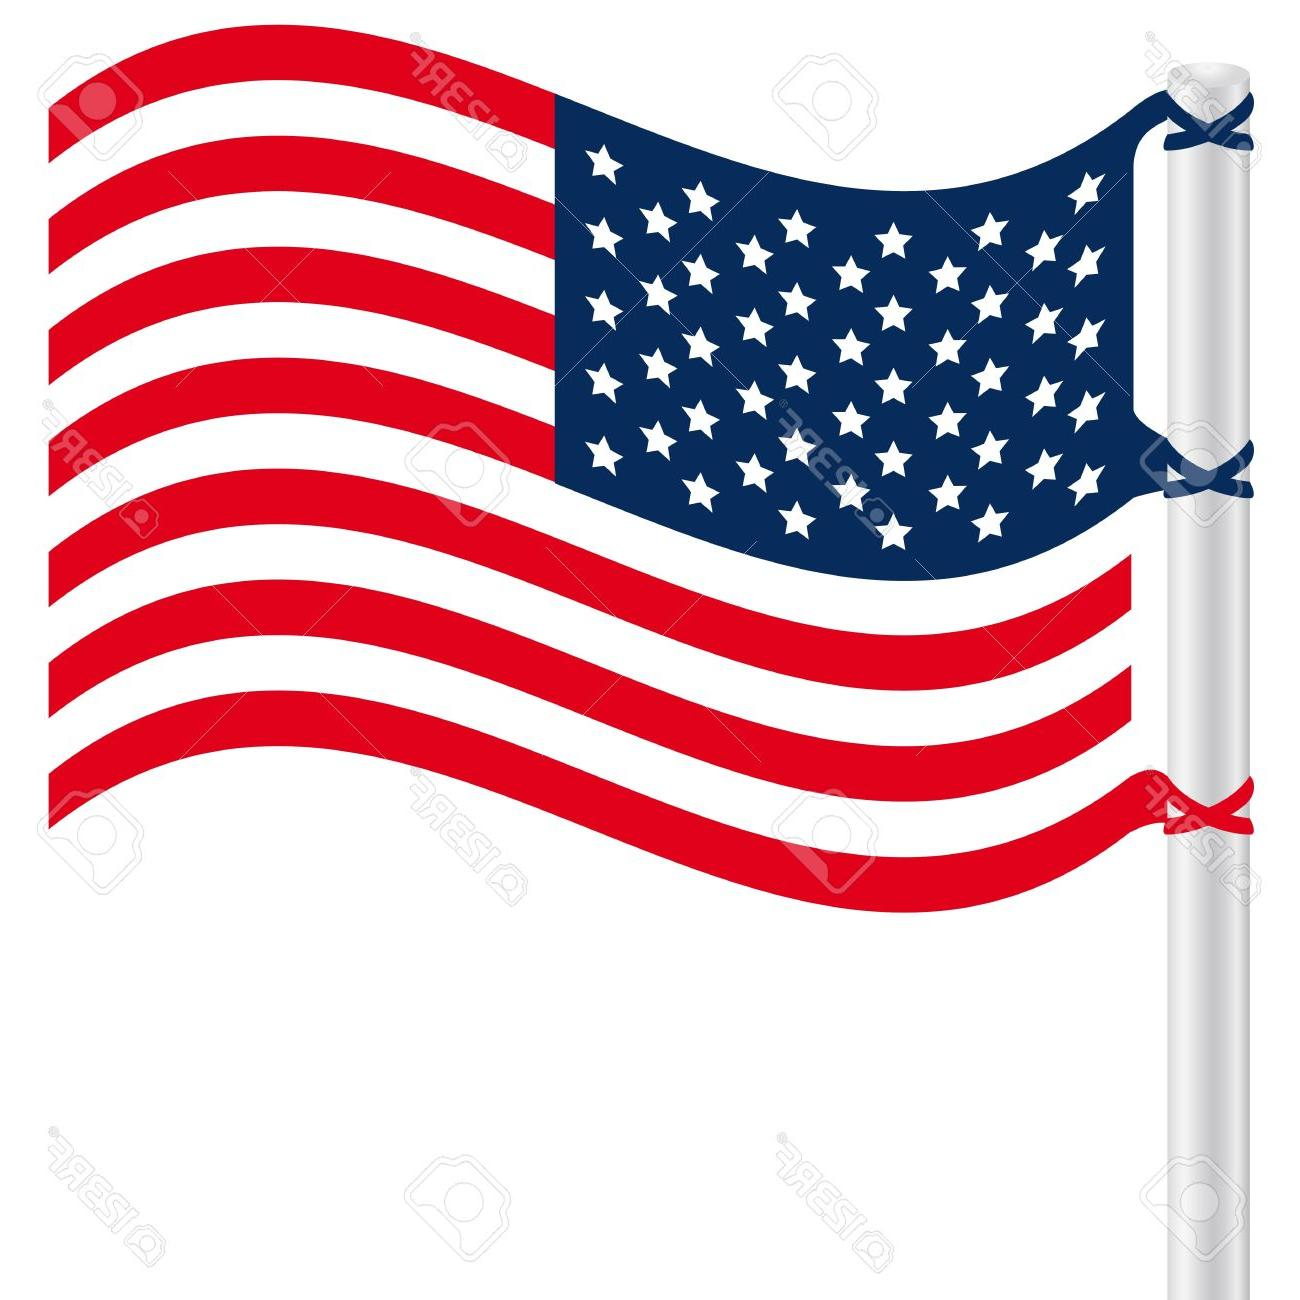 1300x1300 Best Waving American Flag Clip Art Image